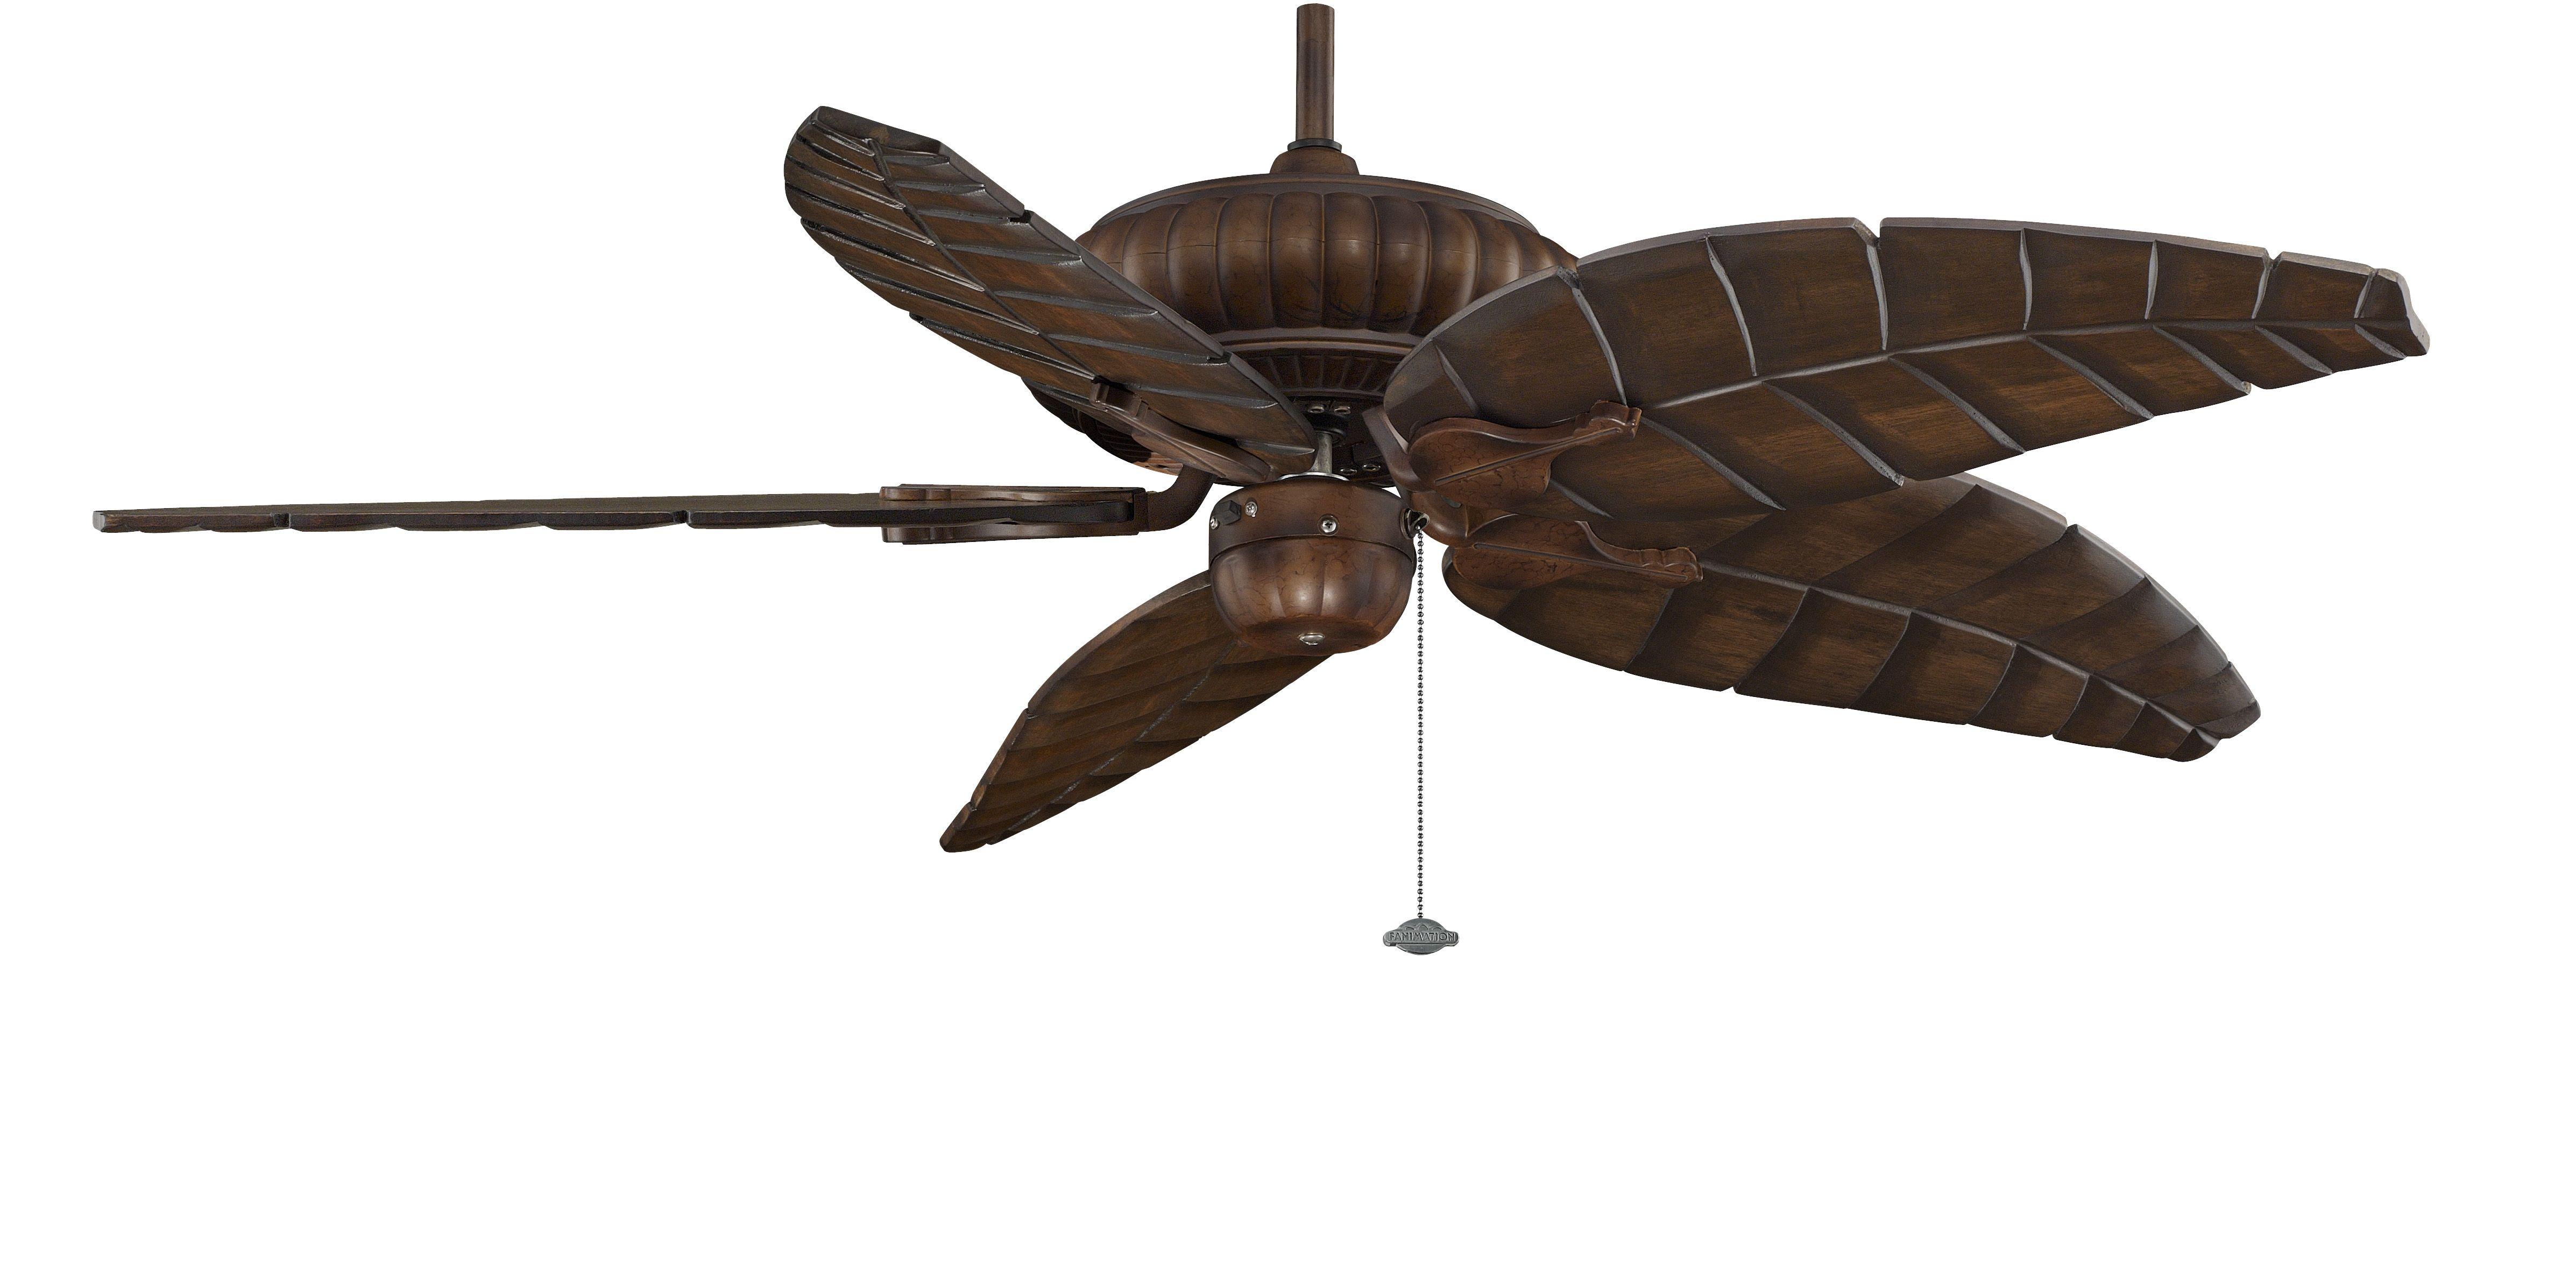 Naples Lighting Fan Depot Showroom In Fl 34103